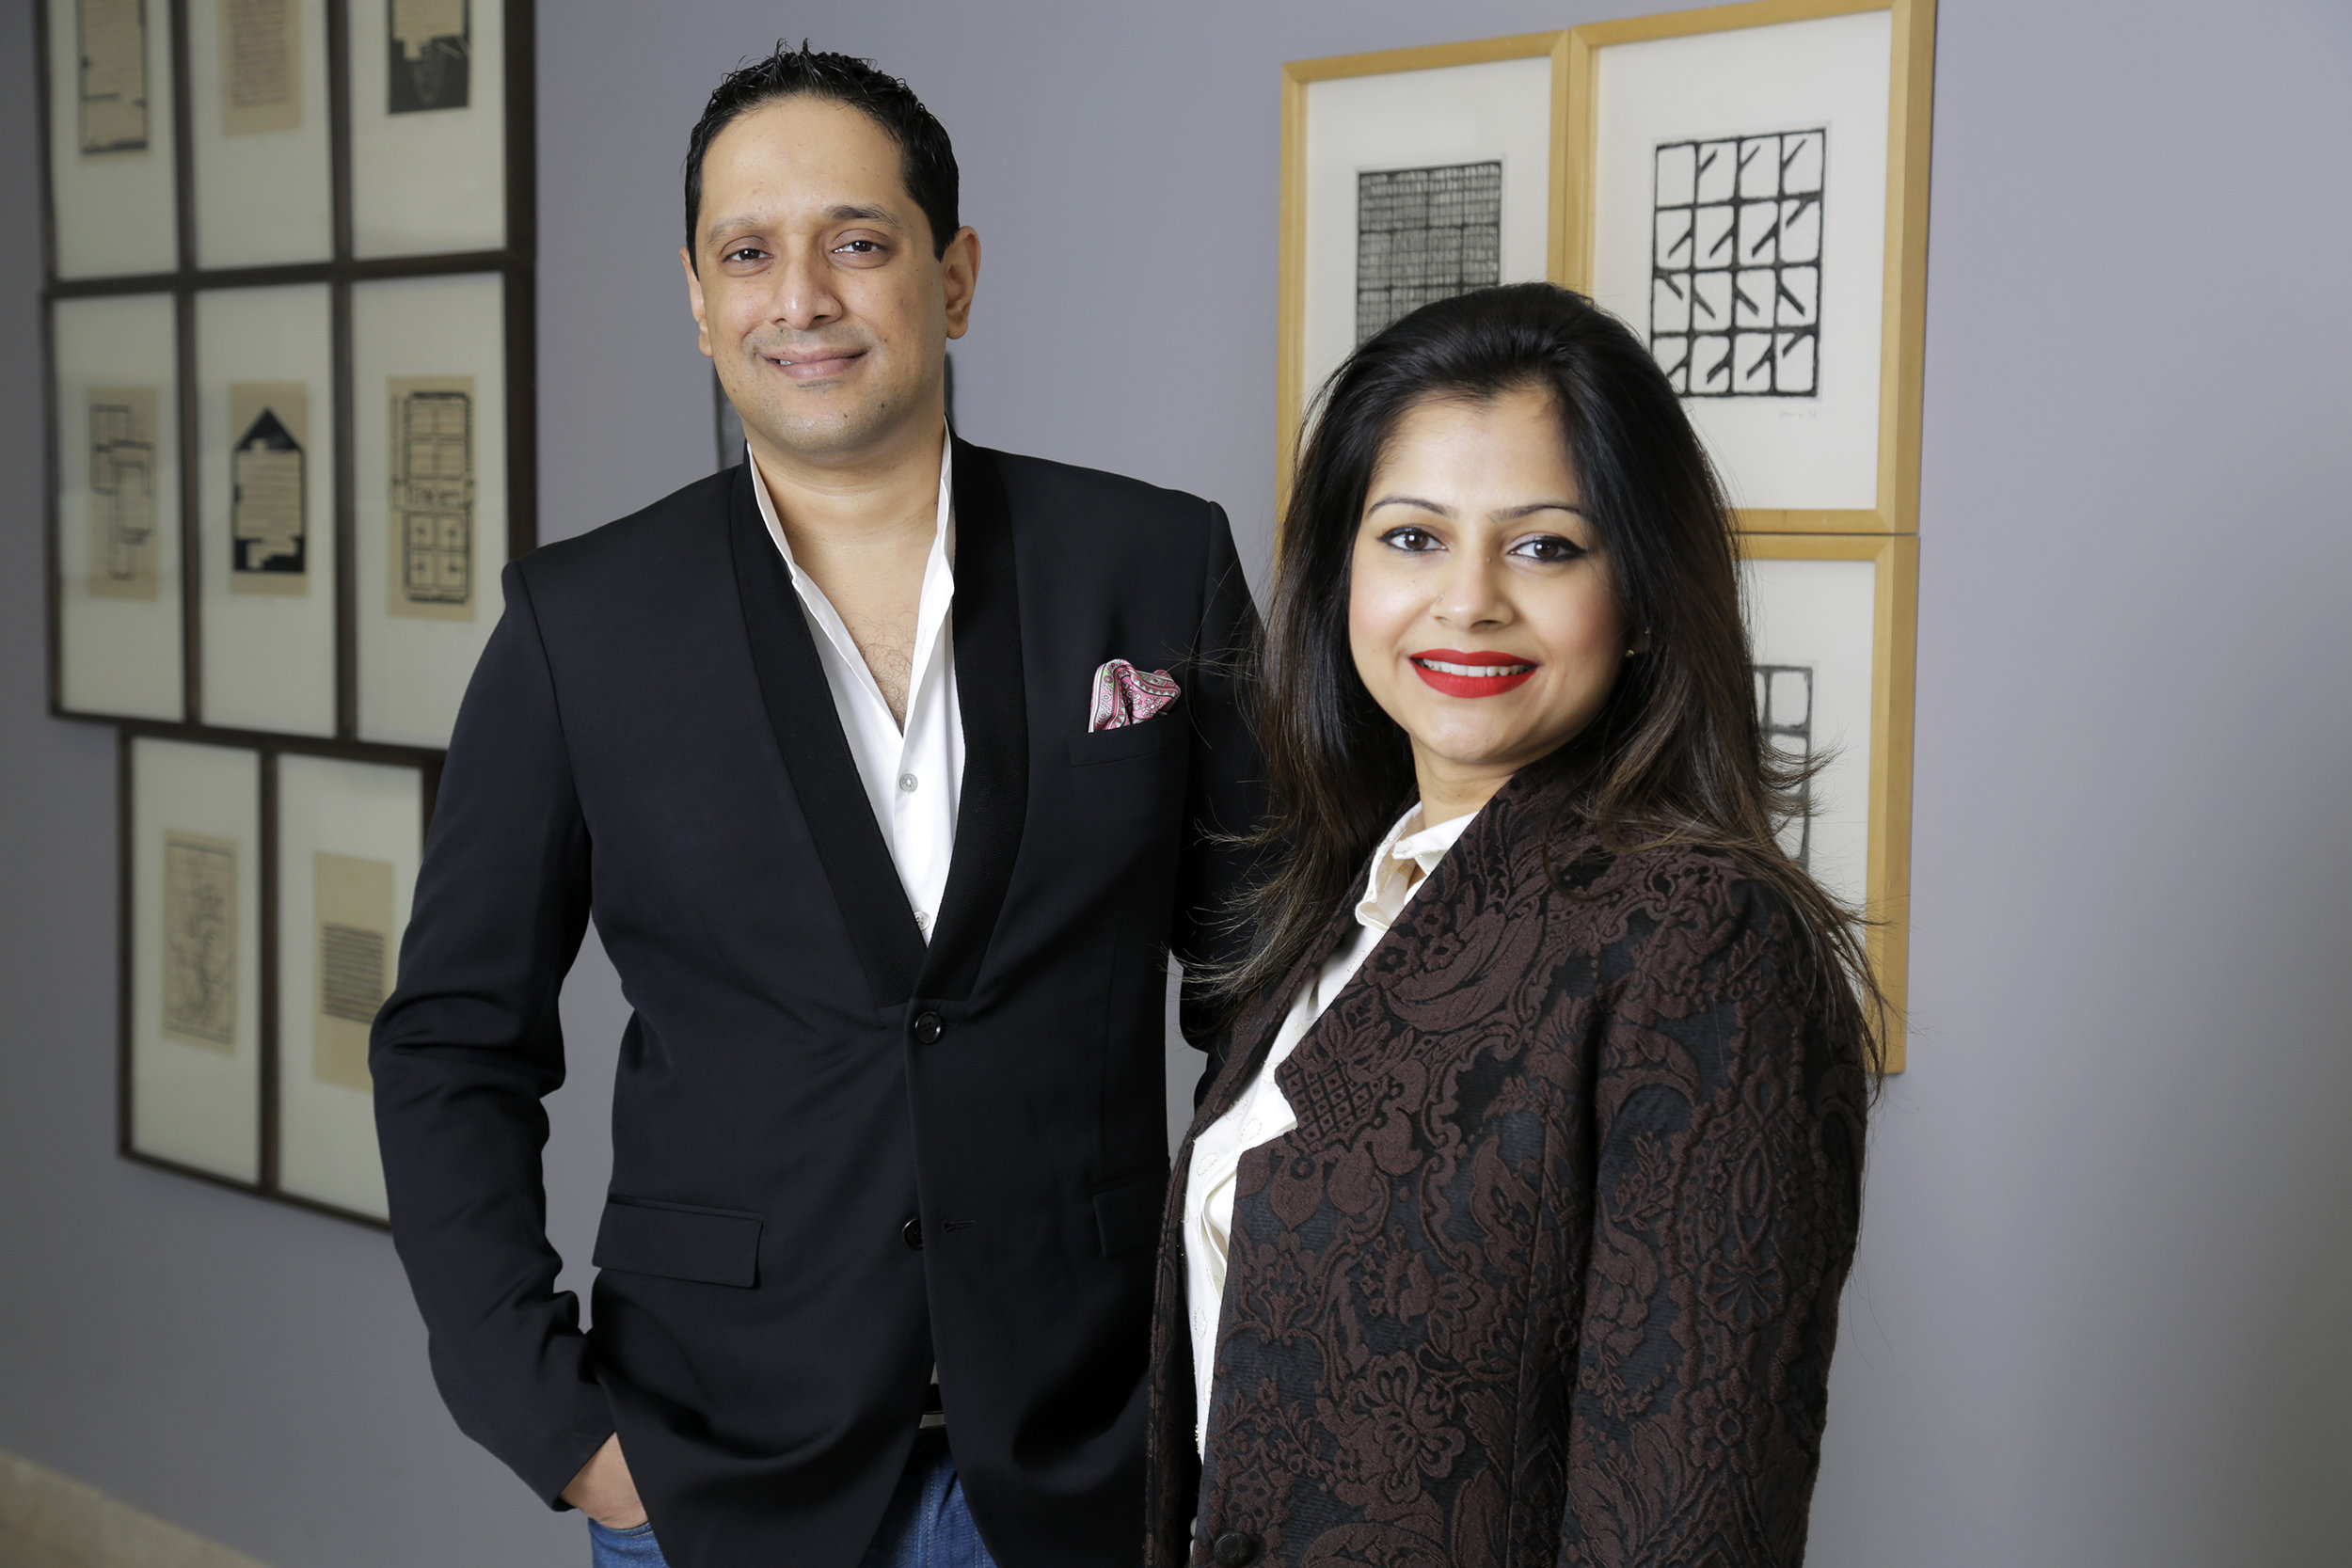 Rajeeb and Nadia Samdani, the recipients of the 2017 Montblanc de la Culture Arts Patronage Award. Courtesy of the Samdanis